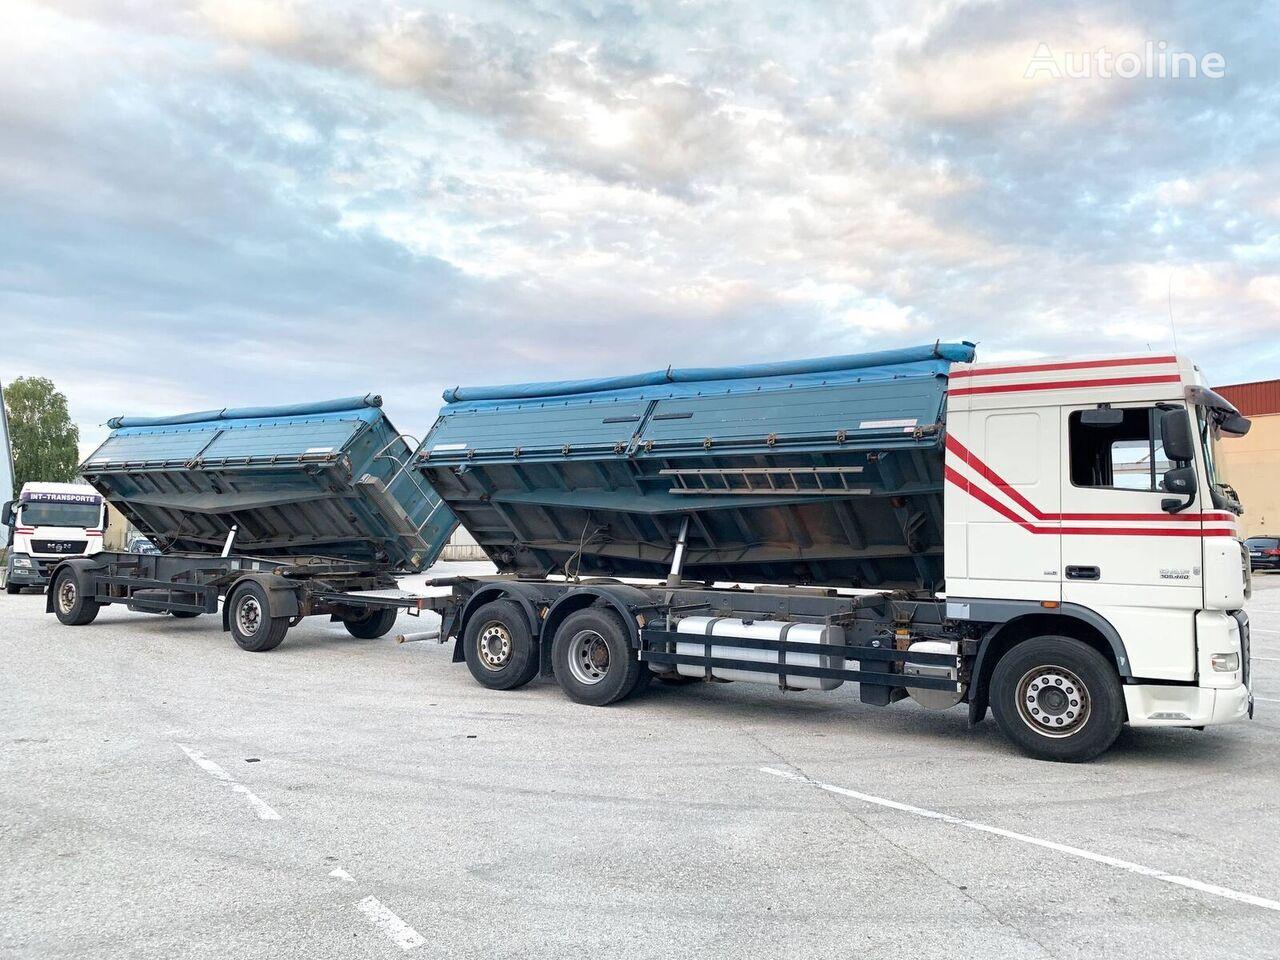 DAF XF105.460 3-Seiten GETREIDEKIPPER+ANHÄNGER // NEUE KUPPLUNG ..:: camión para transporte de grano + remolque para transporte de grano